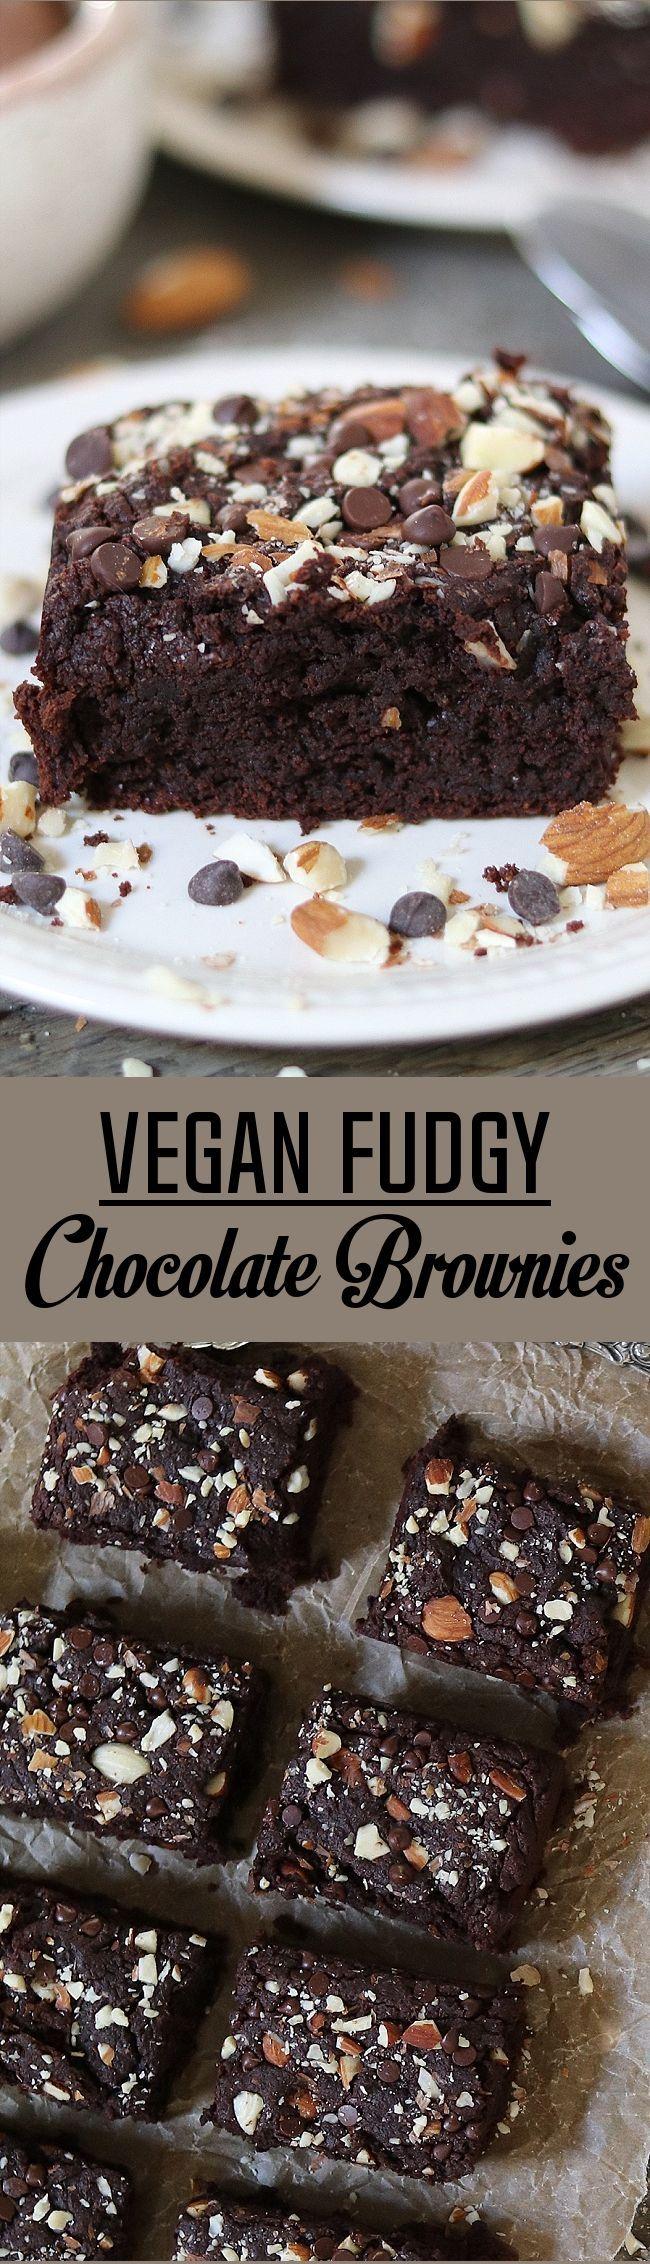 Vegan Fudgy Chocolate Brownies Vegan Fudgy Chocolate Brownies ~ super chocolatey, nutty amp delicious